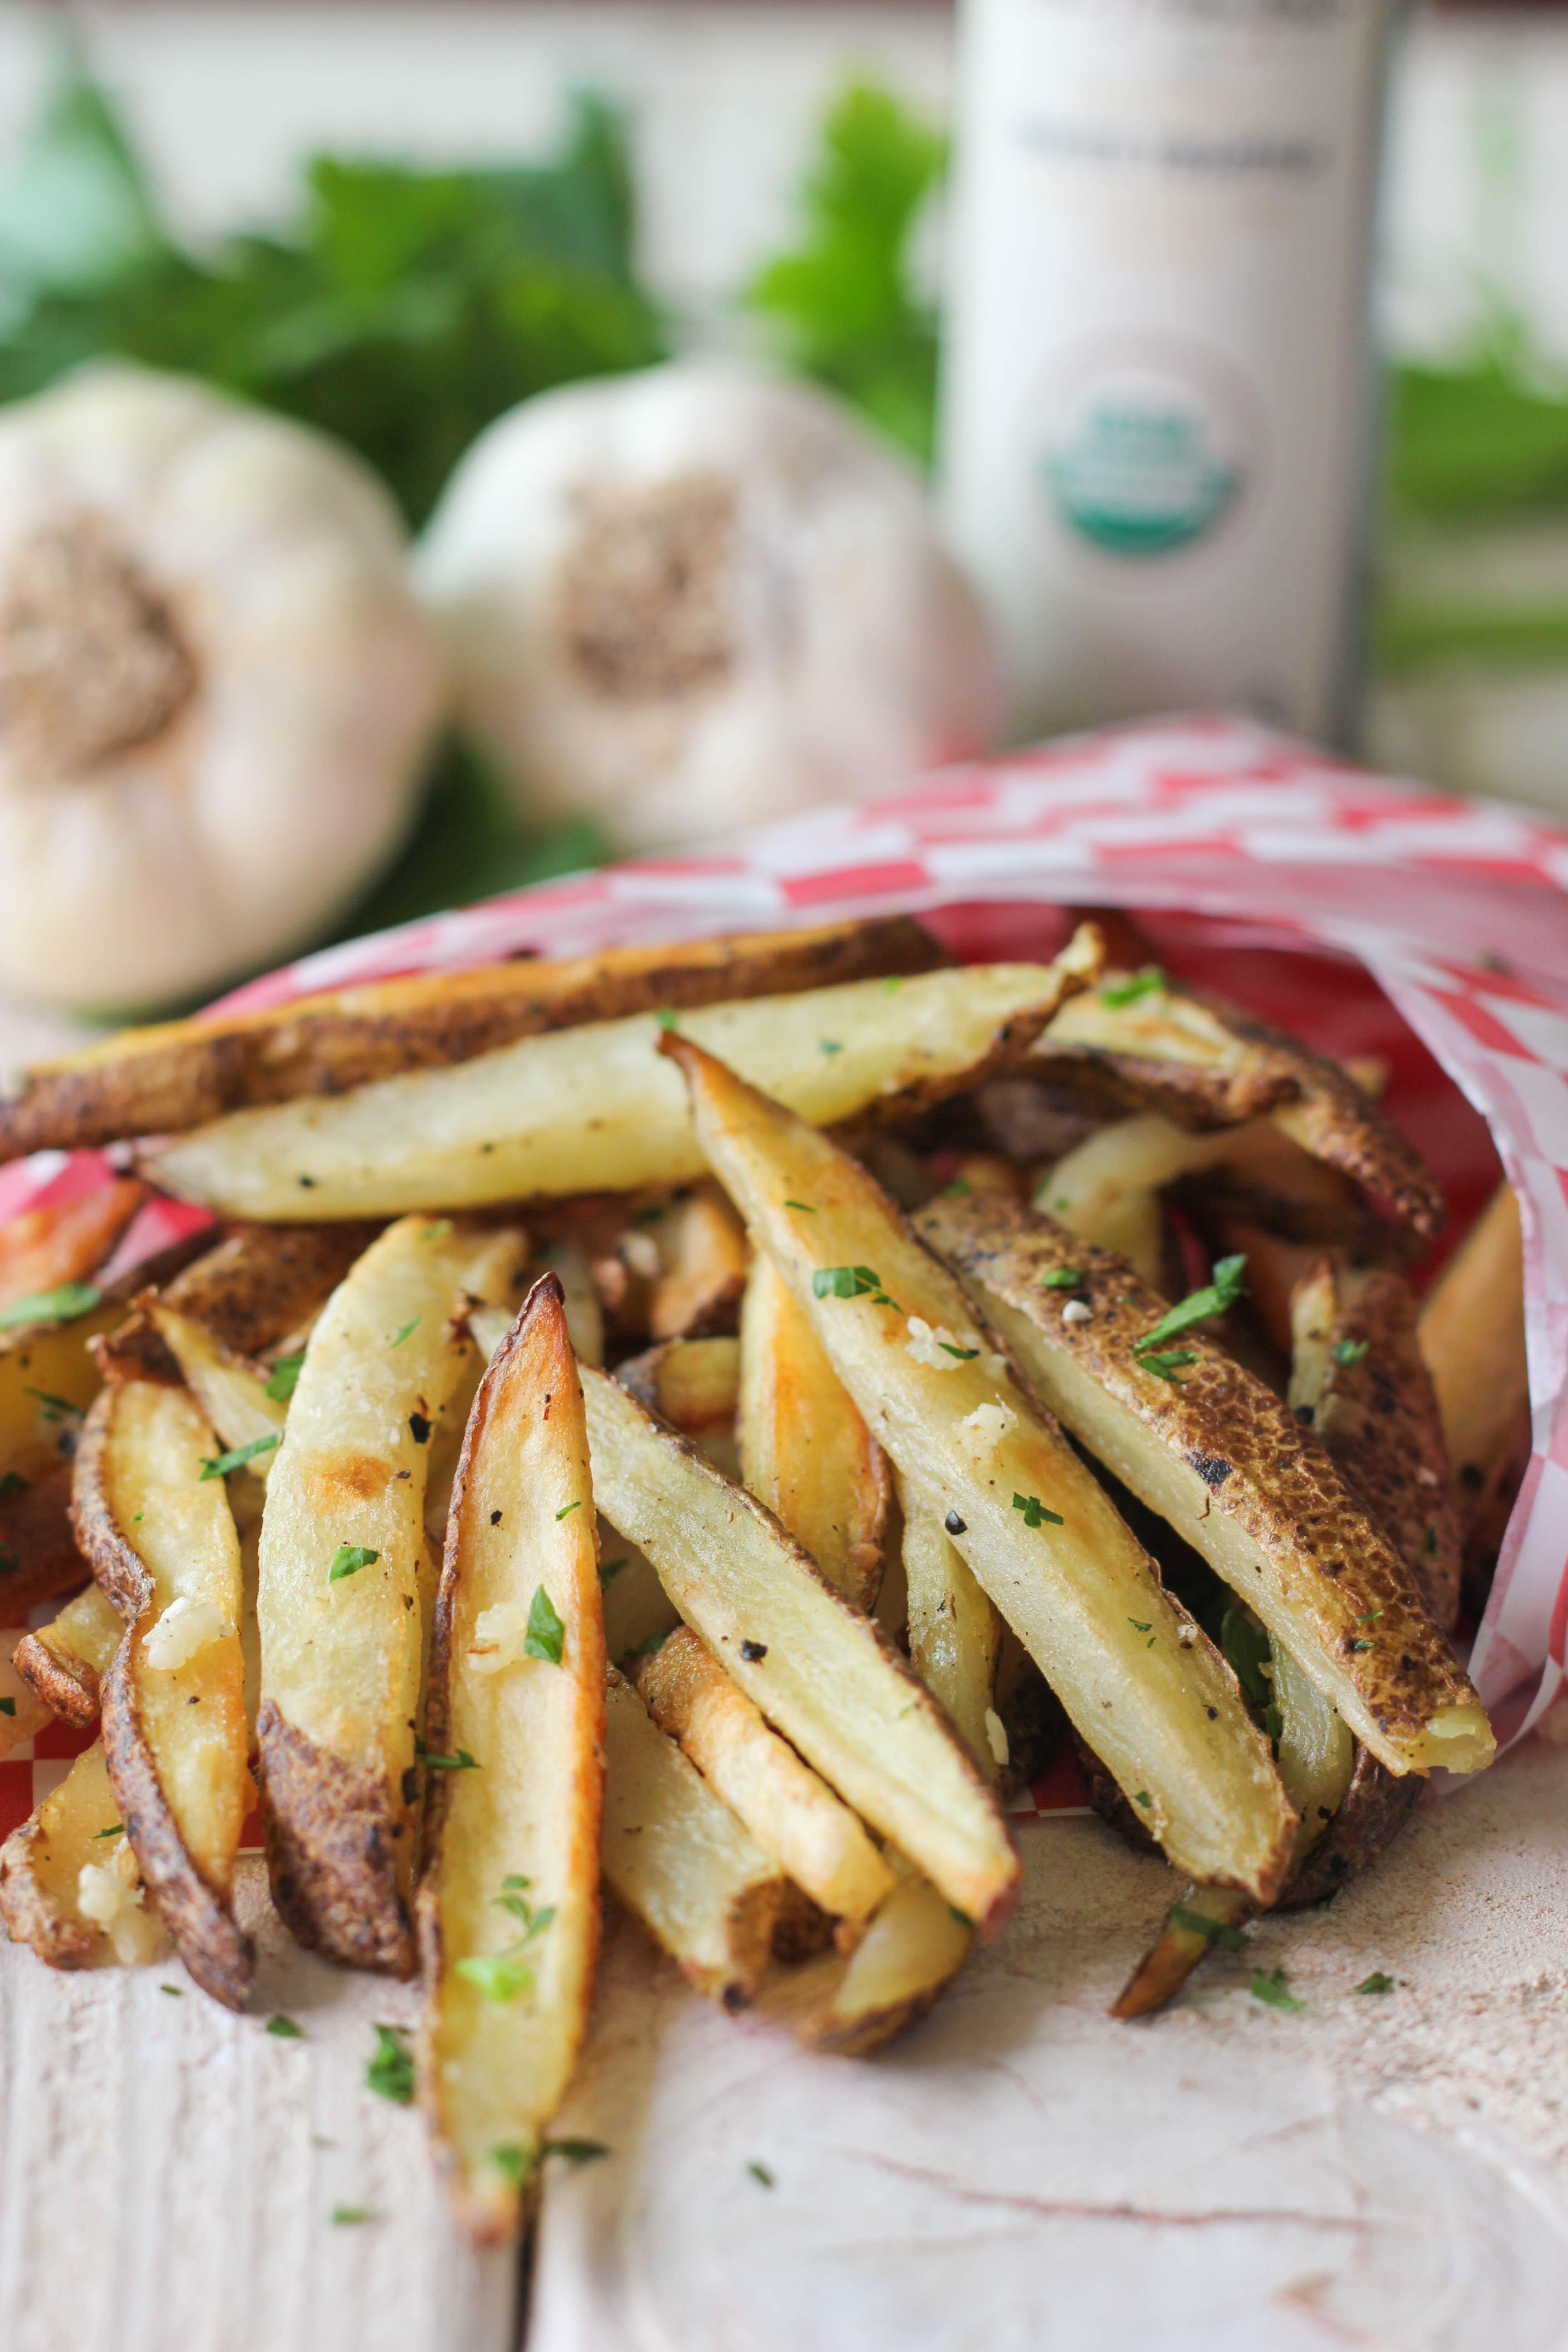 Garlic Truffle Fries - Damn Delicious